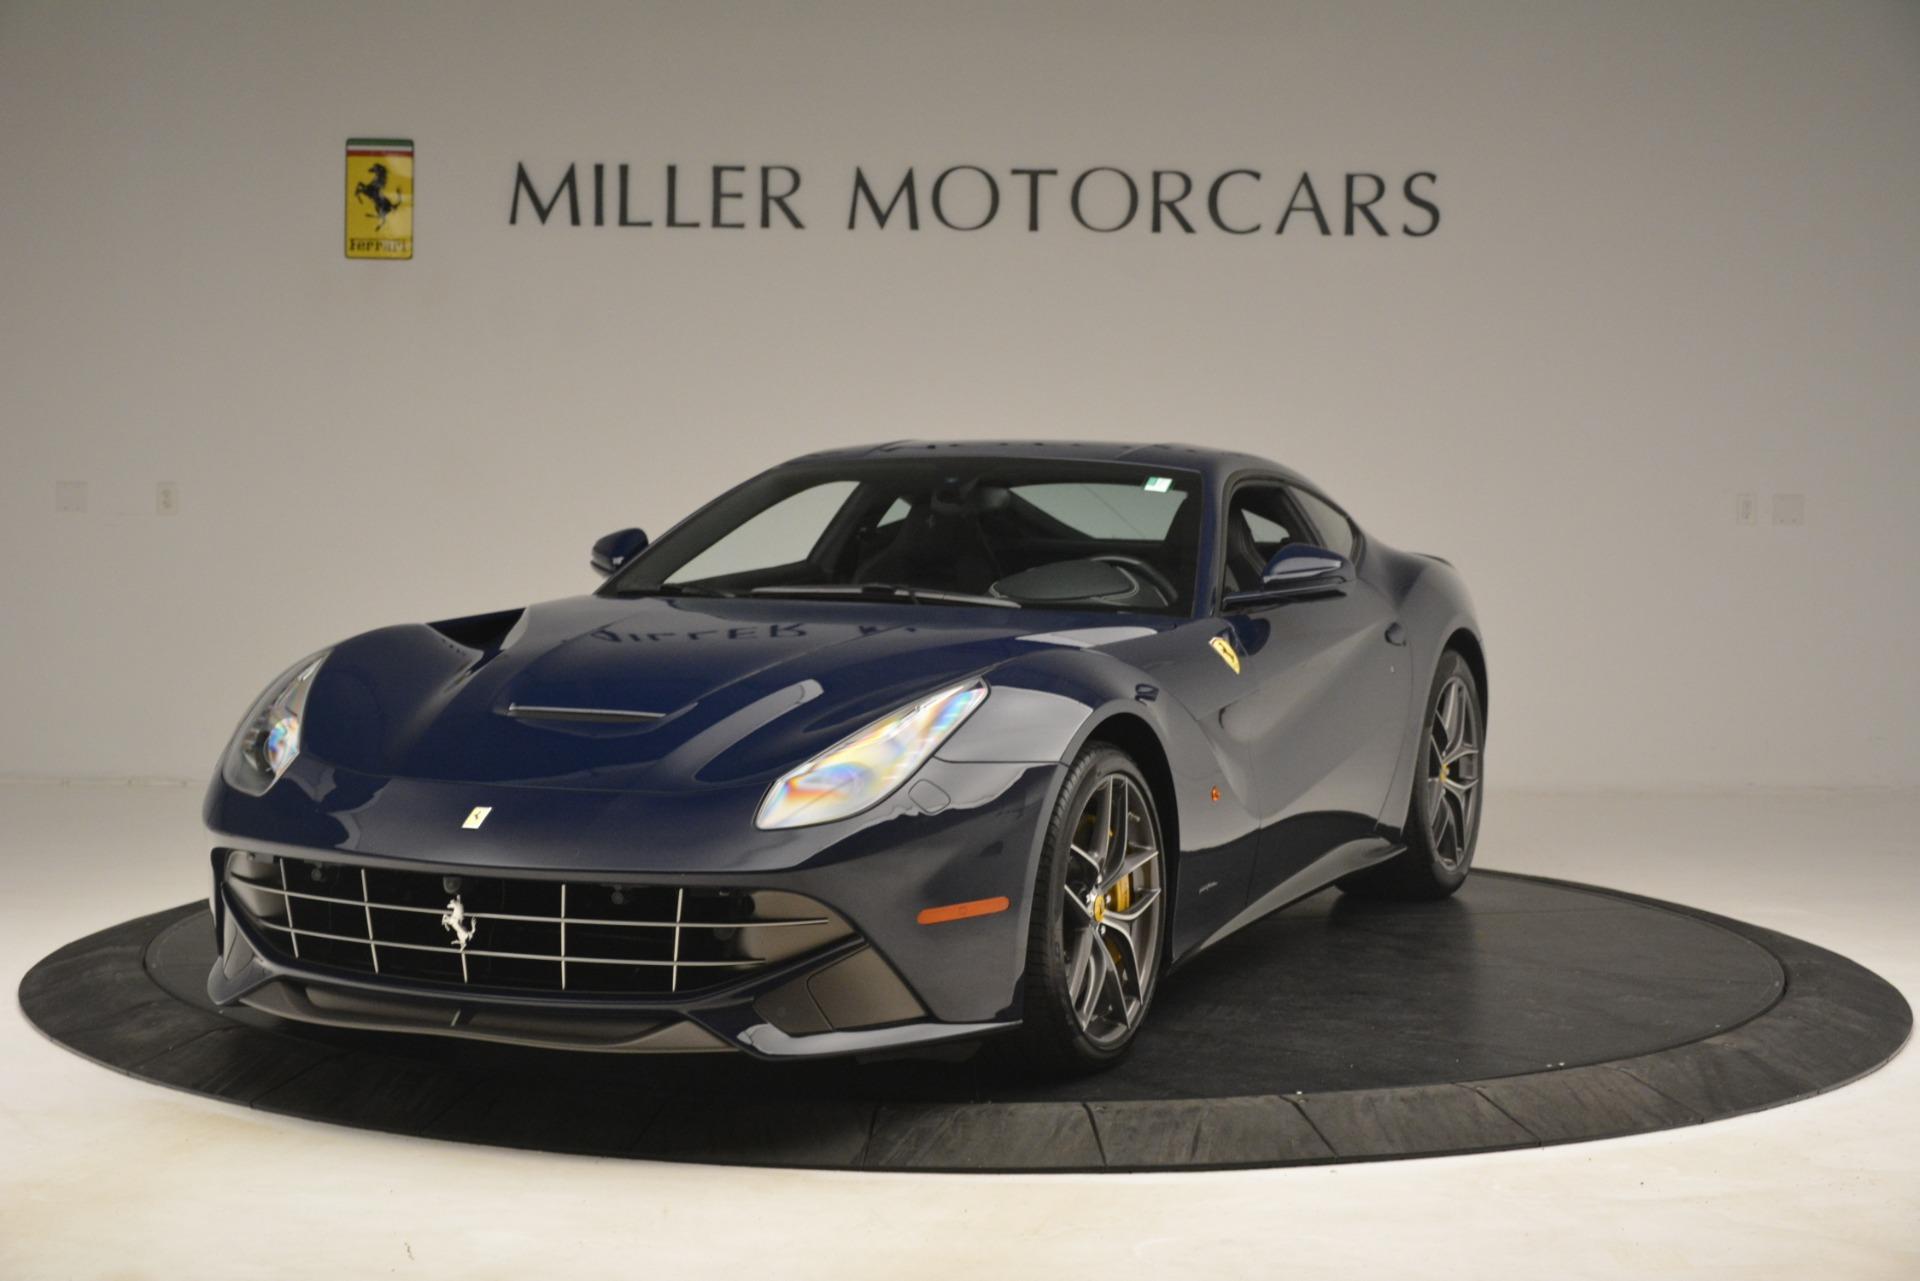 Used 2016 Ferrari F12 Berlinetta for sale Sold at Aston Martin of Greenwich in Greenwich CT 06830 1